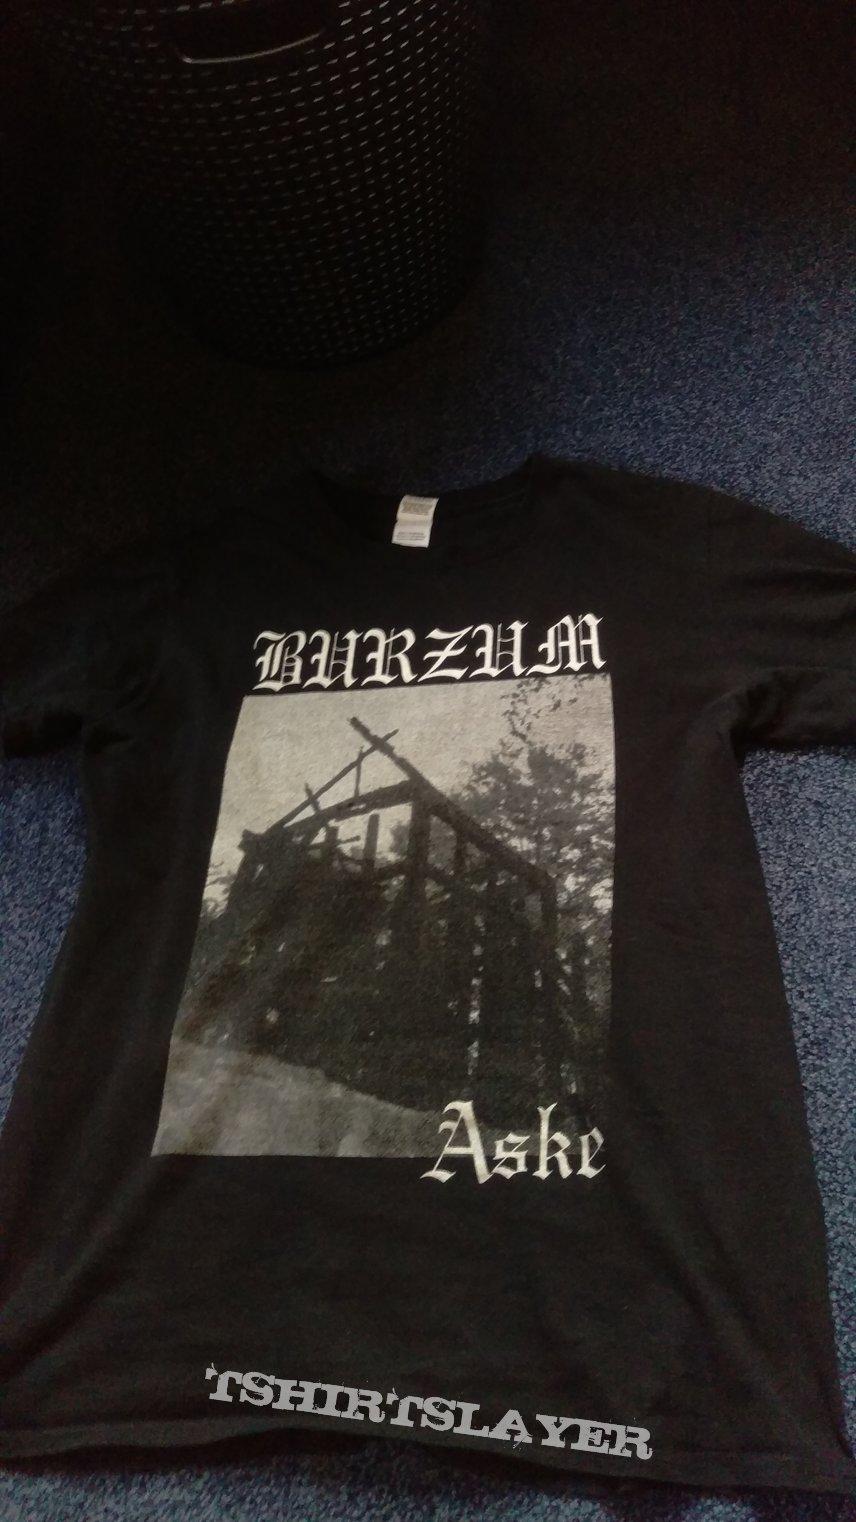 Burzum - Aske shirt